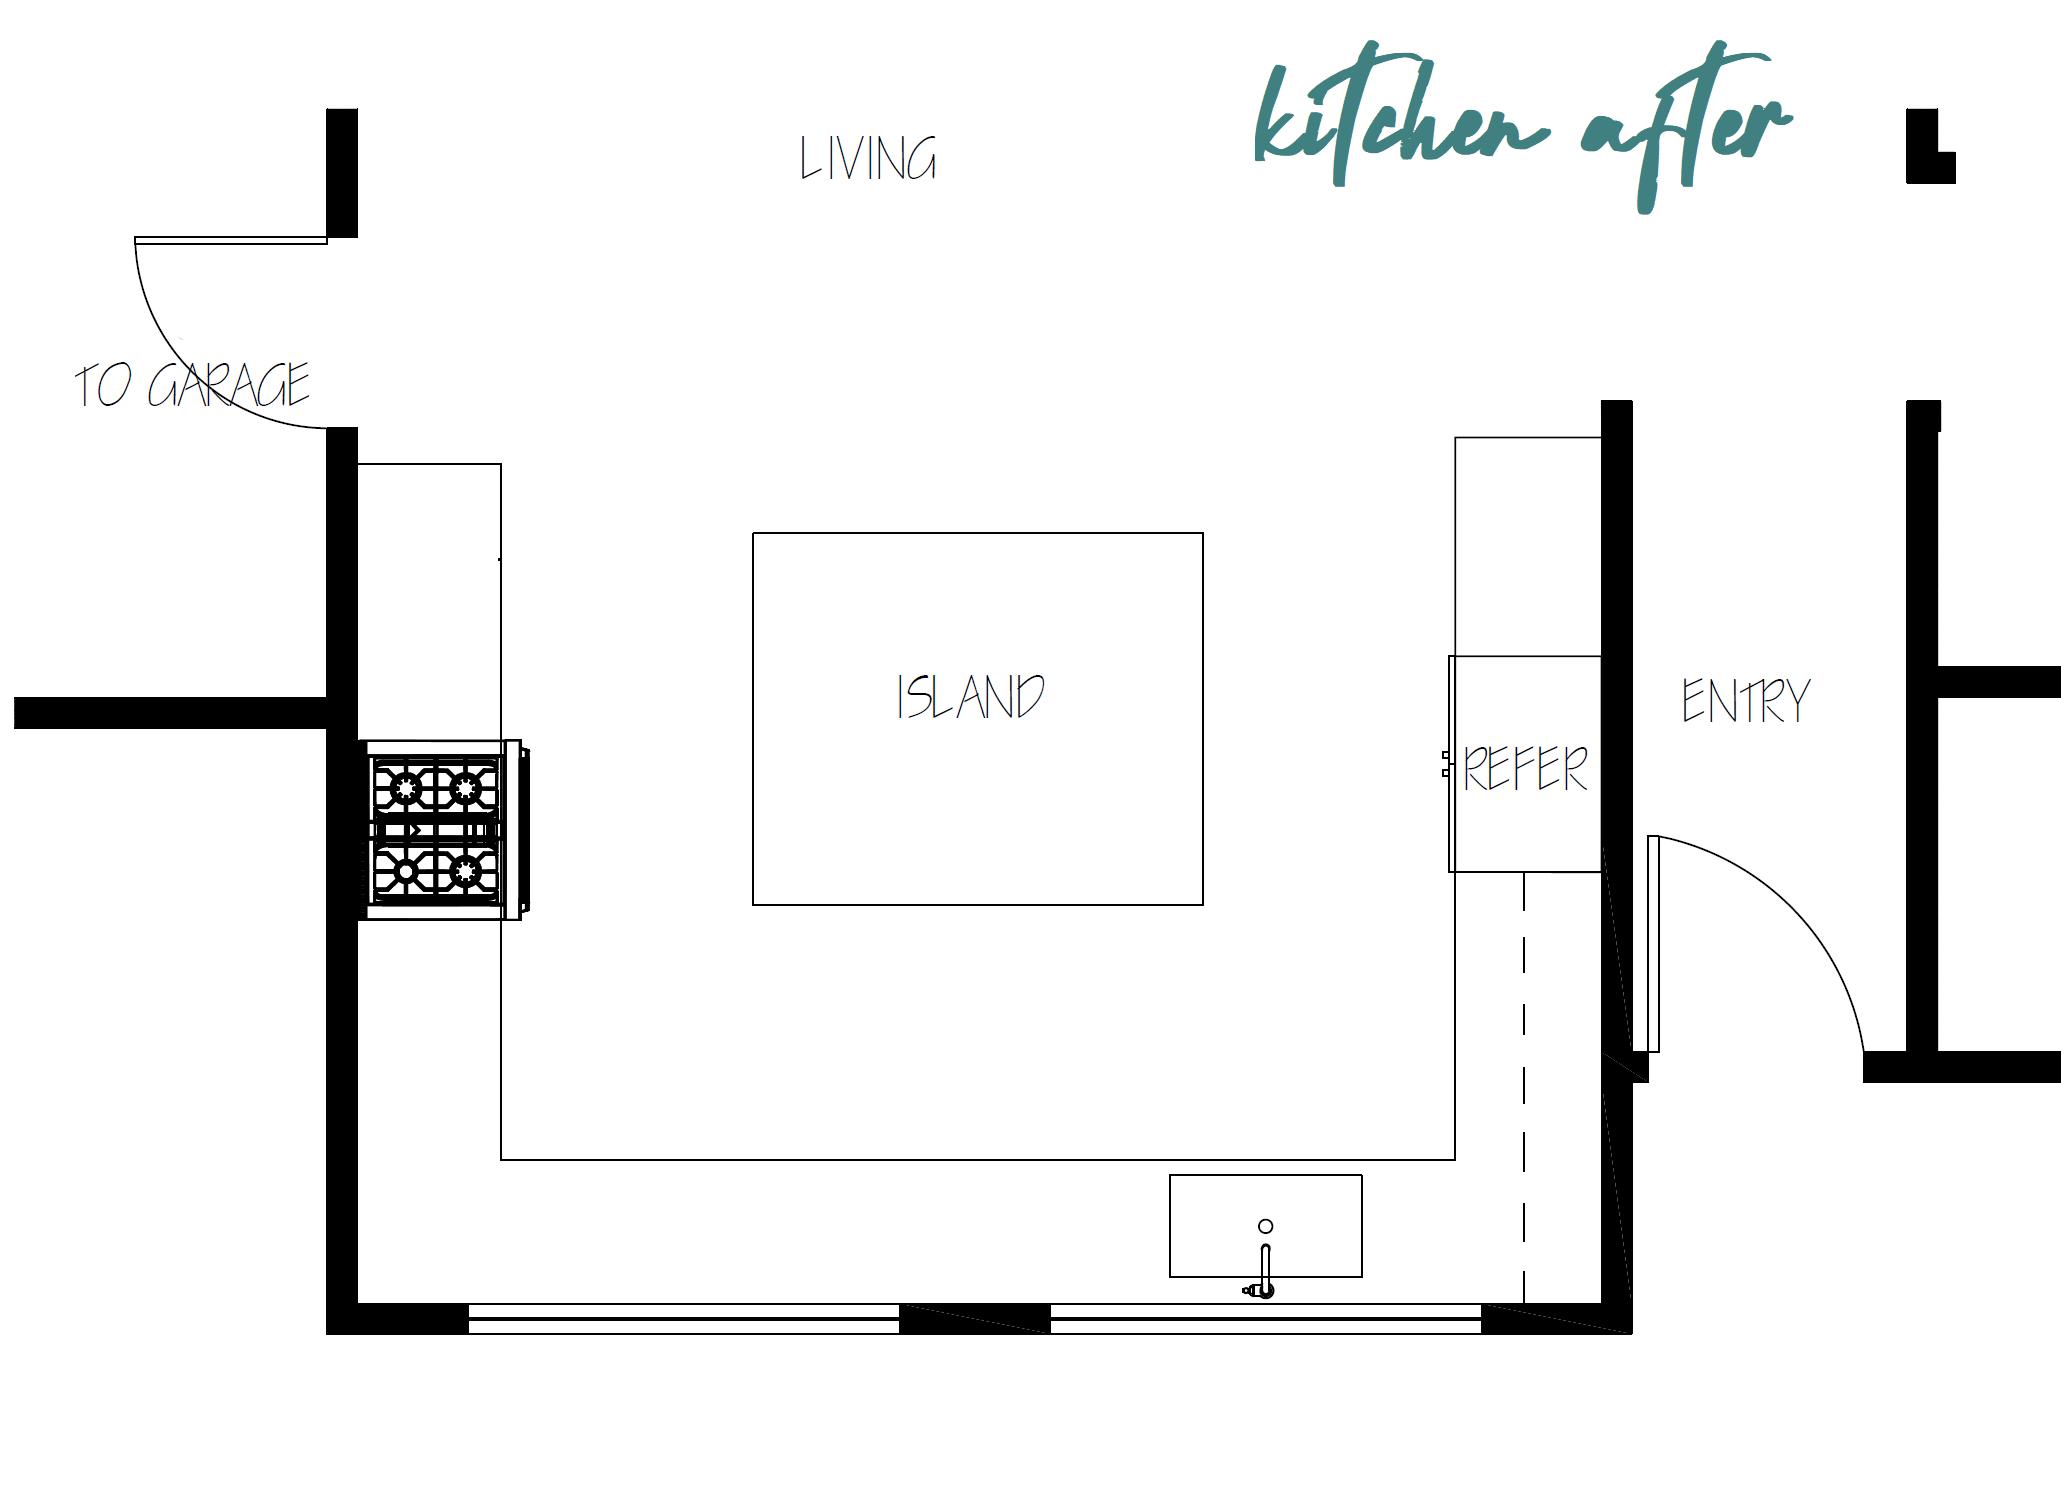 Casey Mason Interiors | KITCHEN AFTER FLOOR PLAN